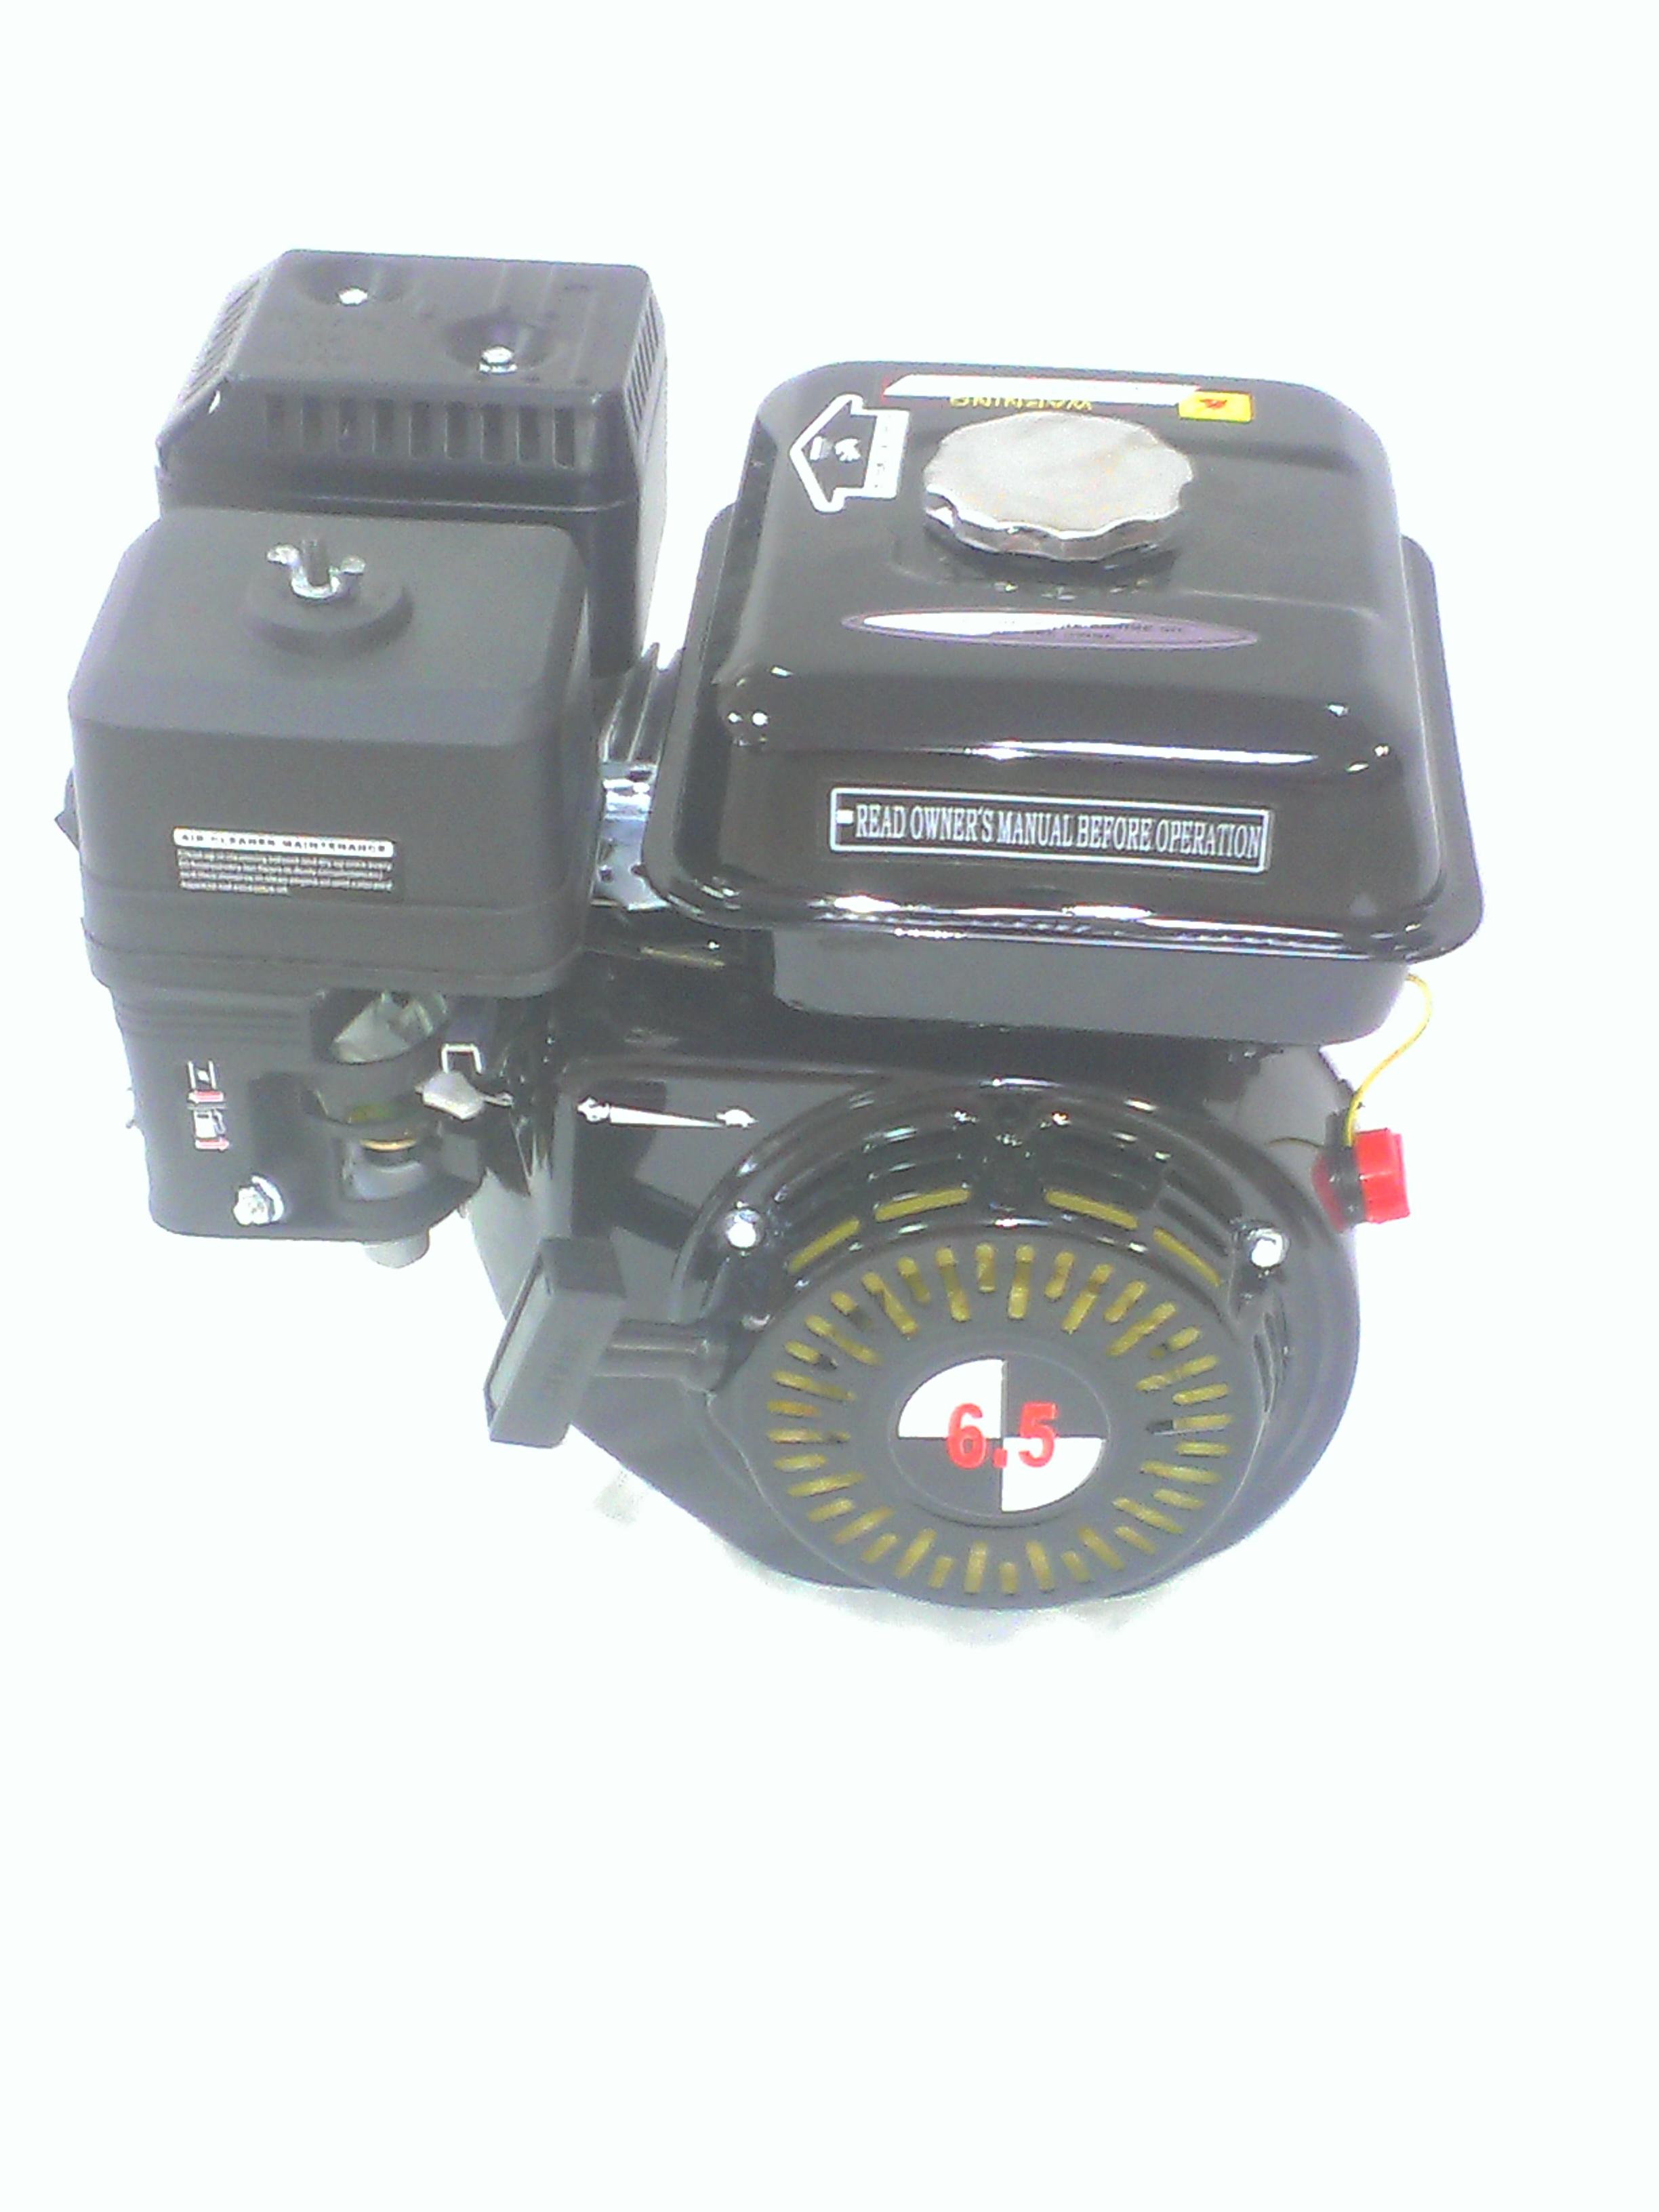 CRAMER KT 168F1 Κινητήρας βενζίνης 6.5hp με βόλτα